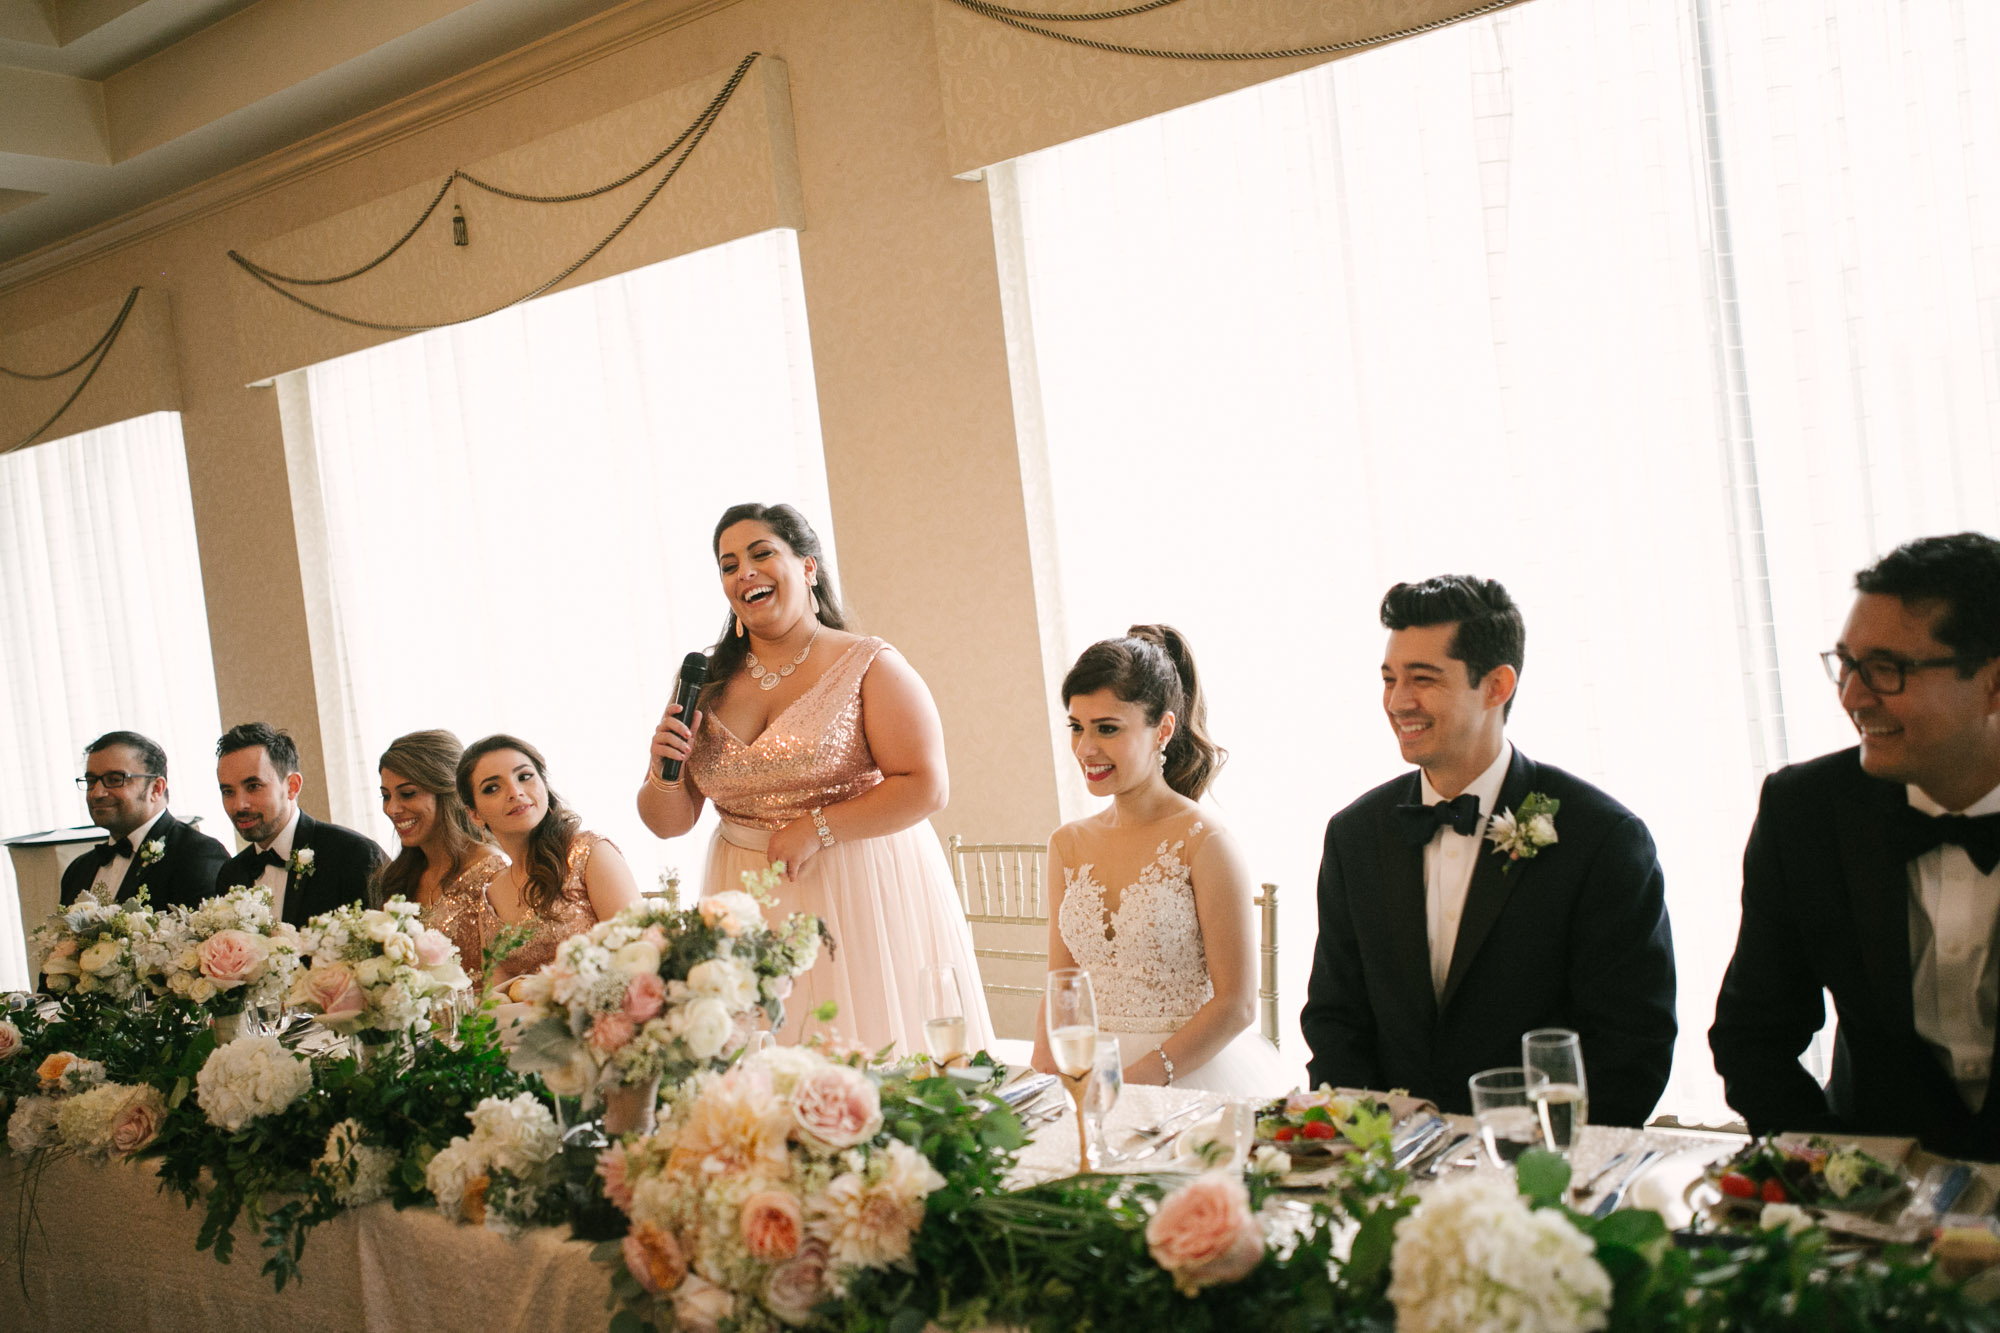 sylvania-country-club-wedding-photos-147.jpg